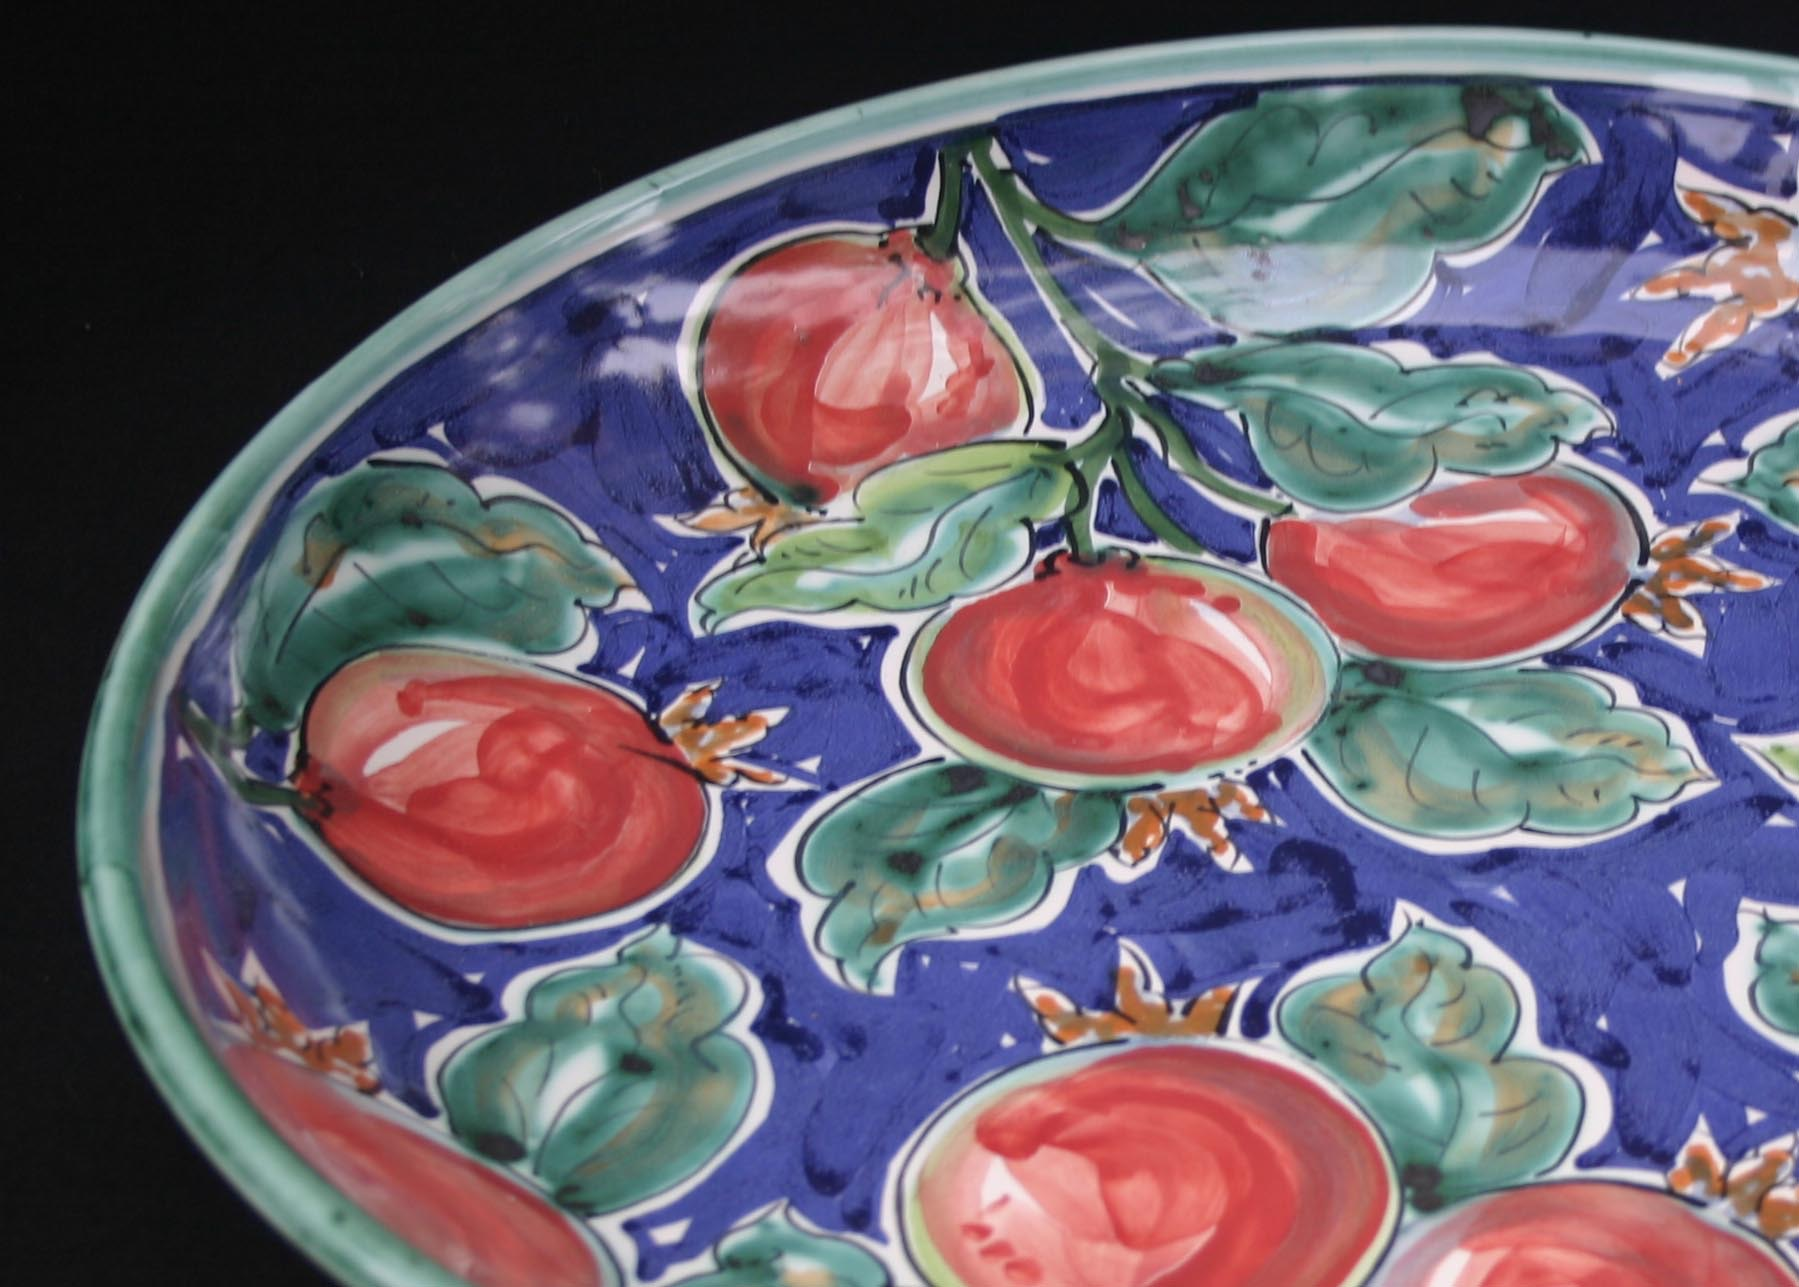 pomegranate crop.jpg